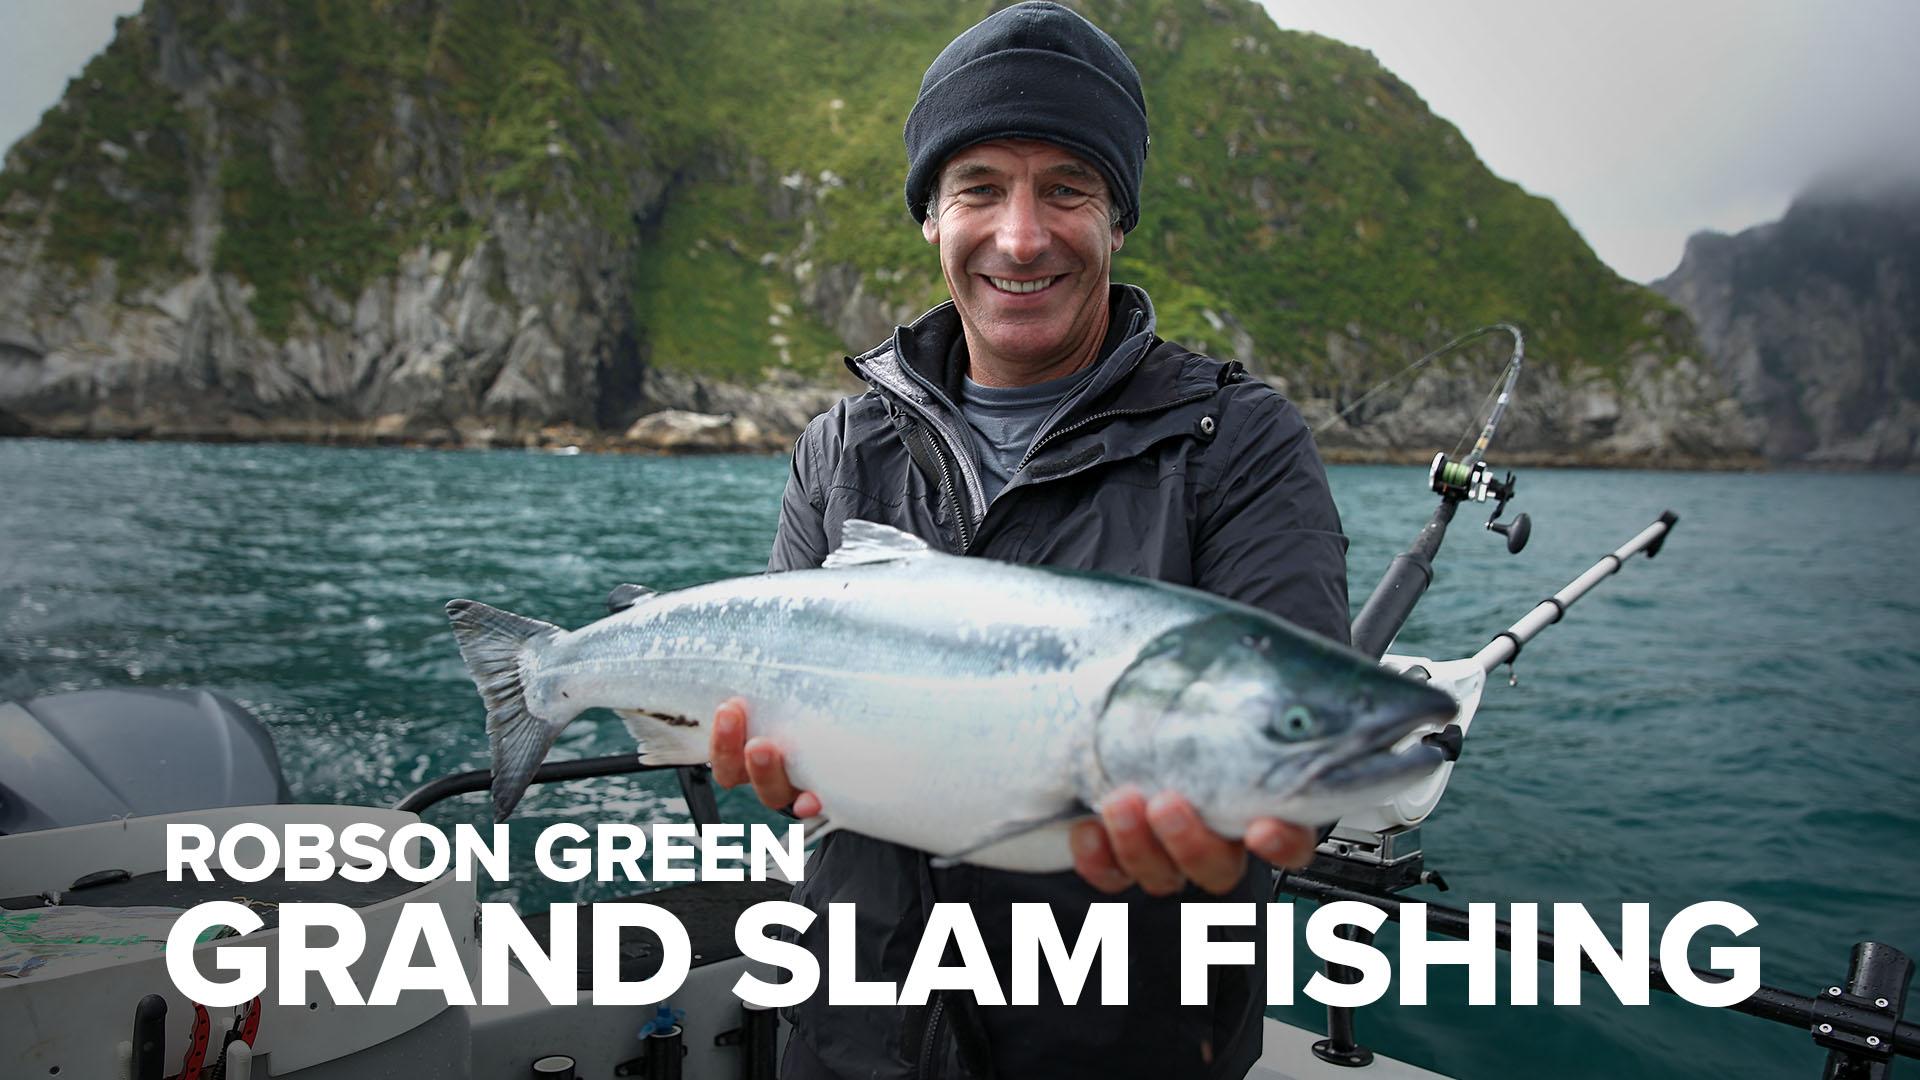 Robson Green's Grand Slam Fishing